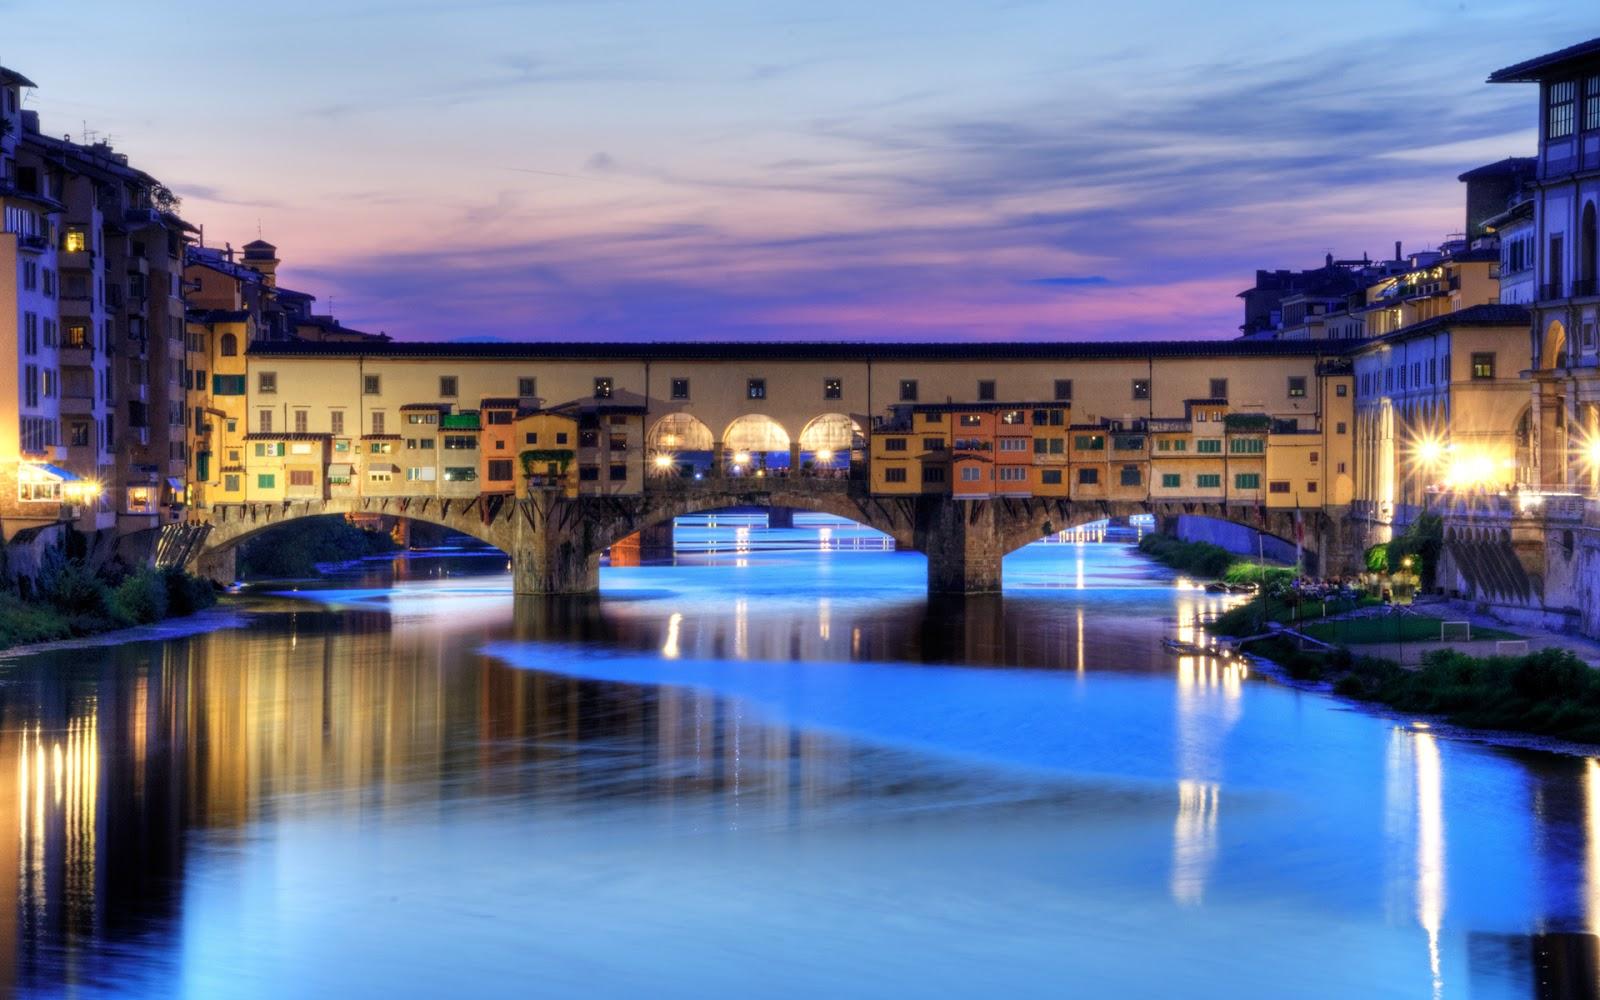 Italian Florence: Ponte Vecchio Florence Italy